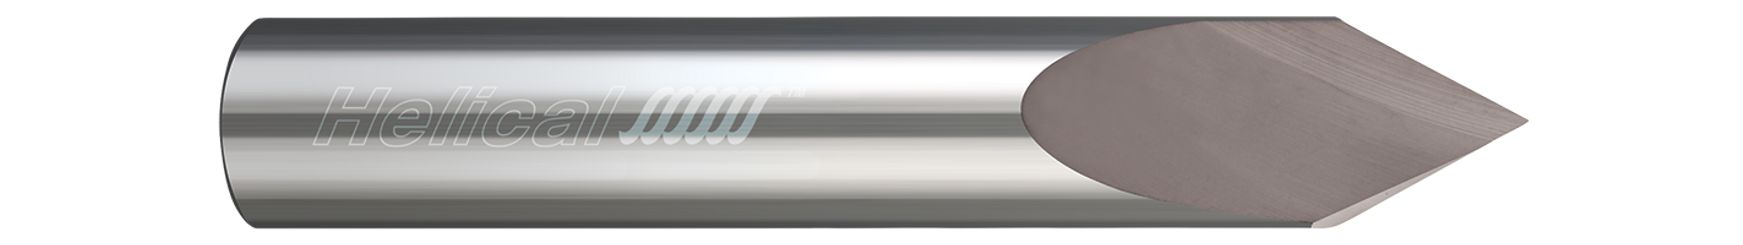 tool-details-06285